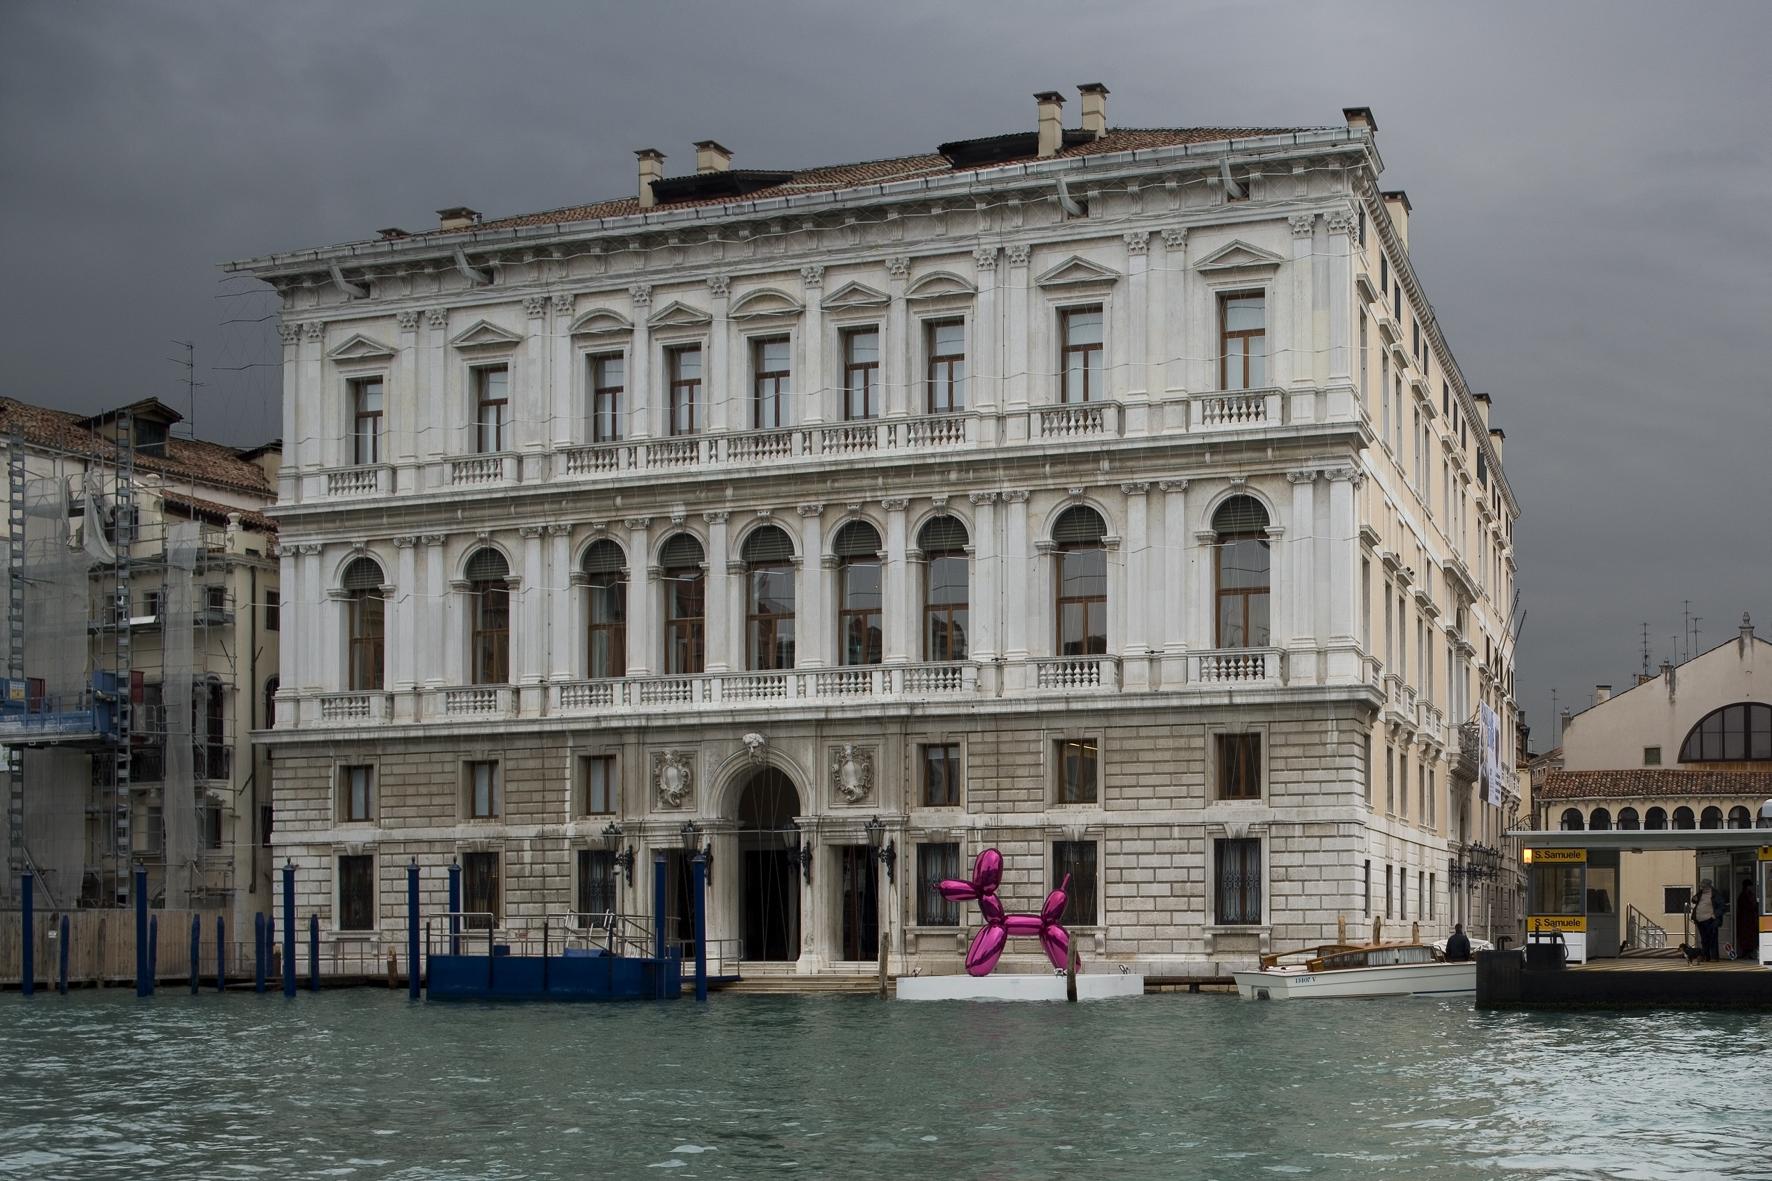 Jeff Koons au Palazzo Grassi, Venise Image via quitecontinental.net